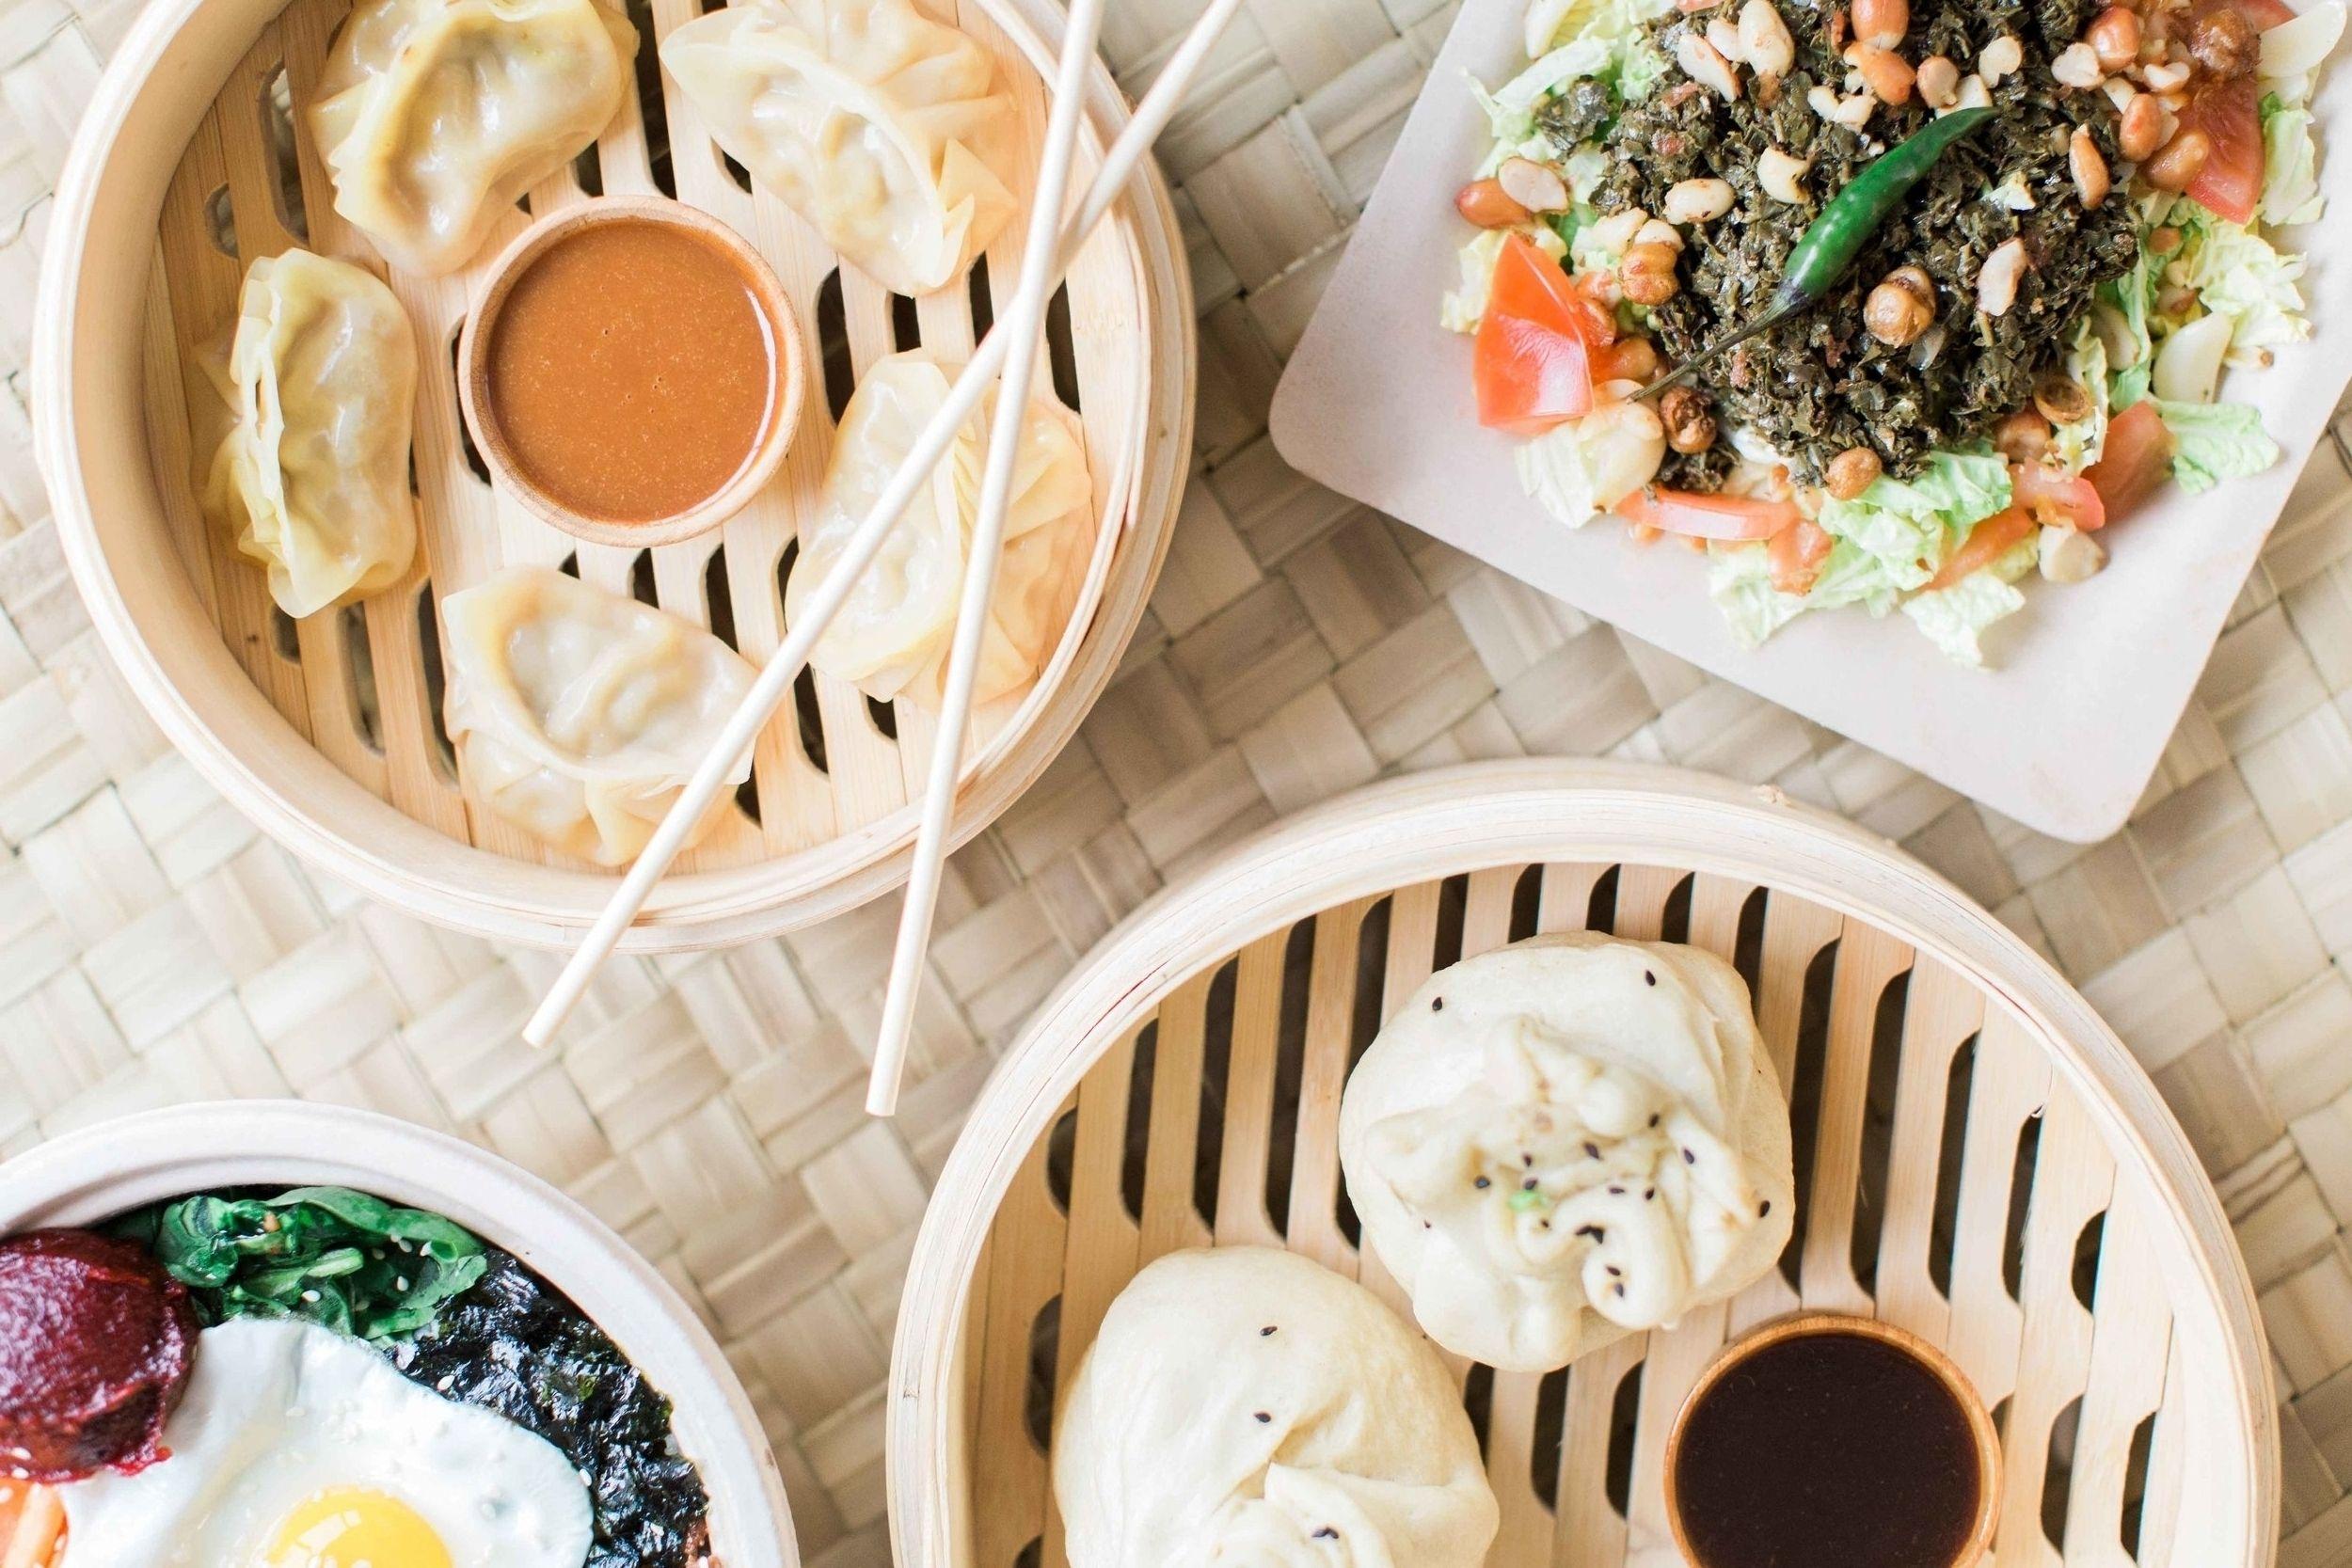 Dumplingdarlingfoodtrayjpg food street food dumpling